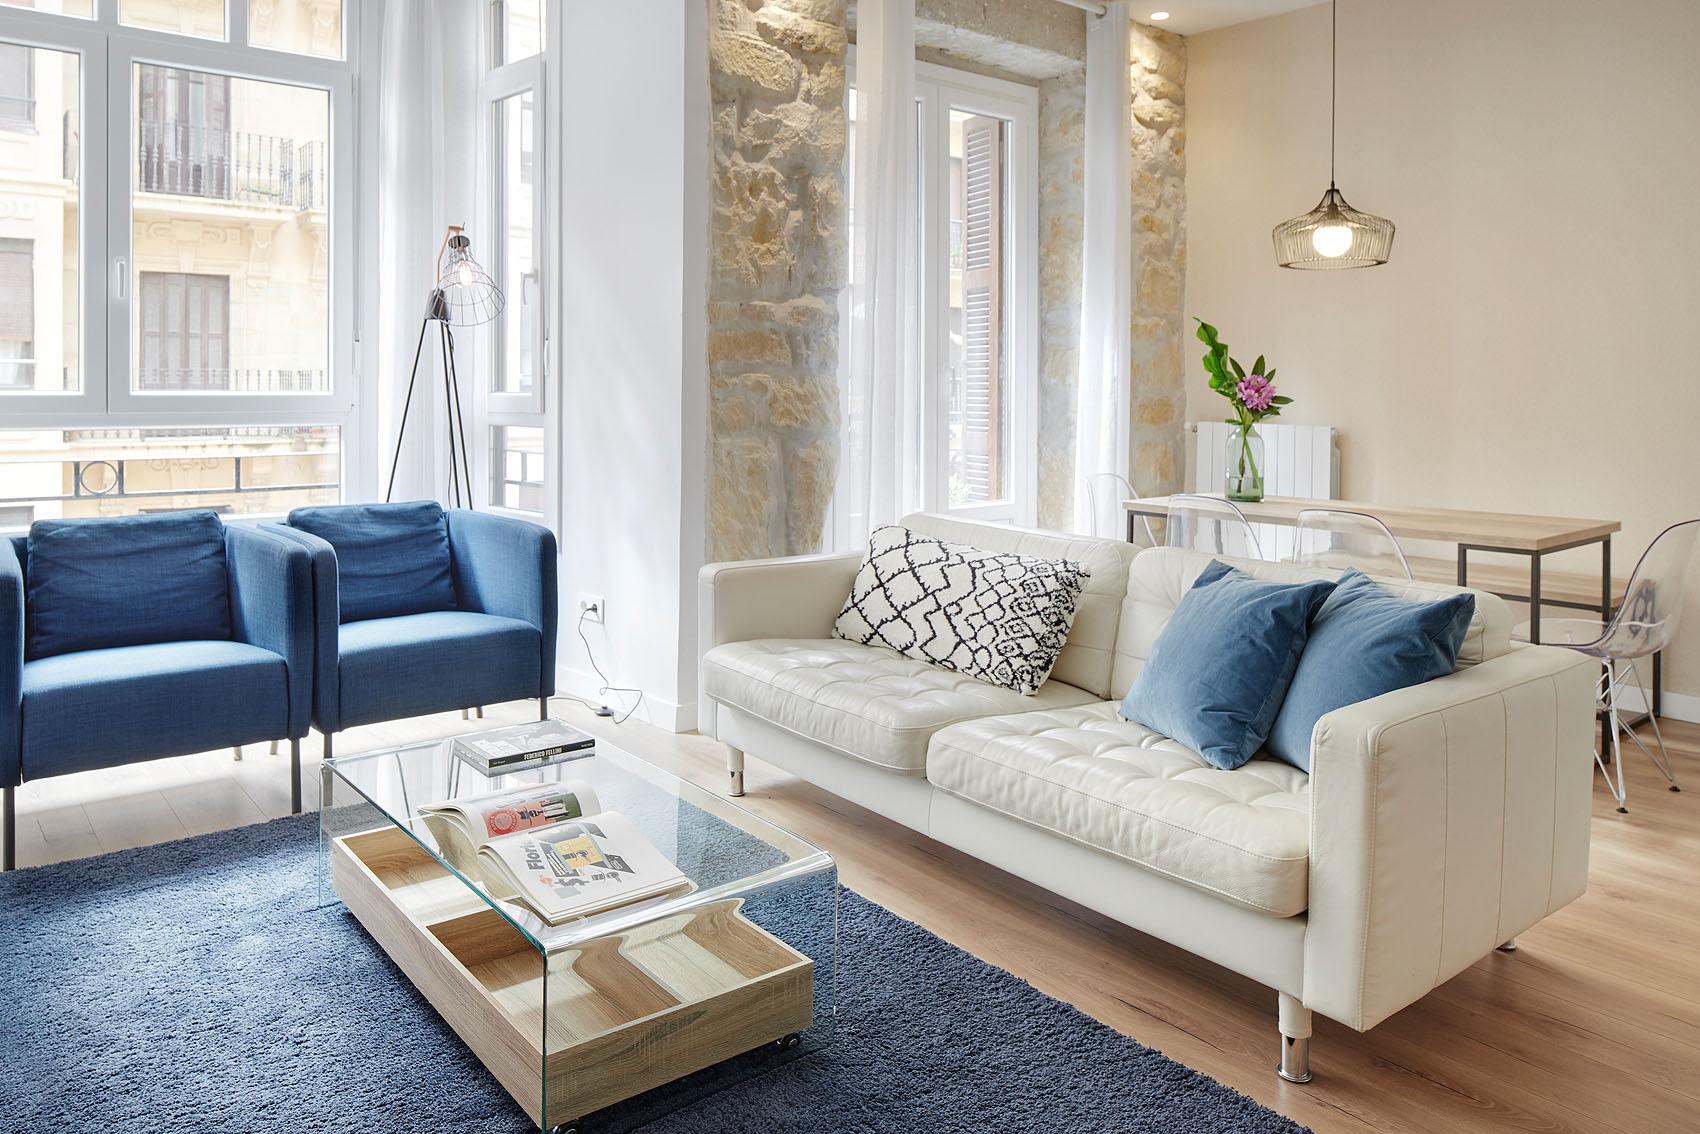 Apartamento Urumea By Feelfree Rentals - Iñaki Caperochipi - Fotografía